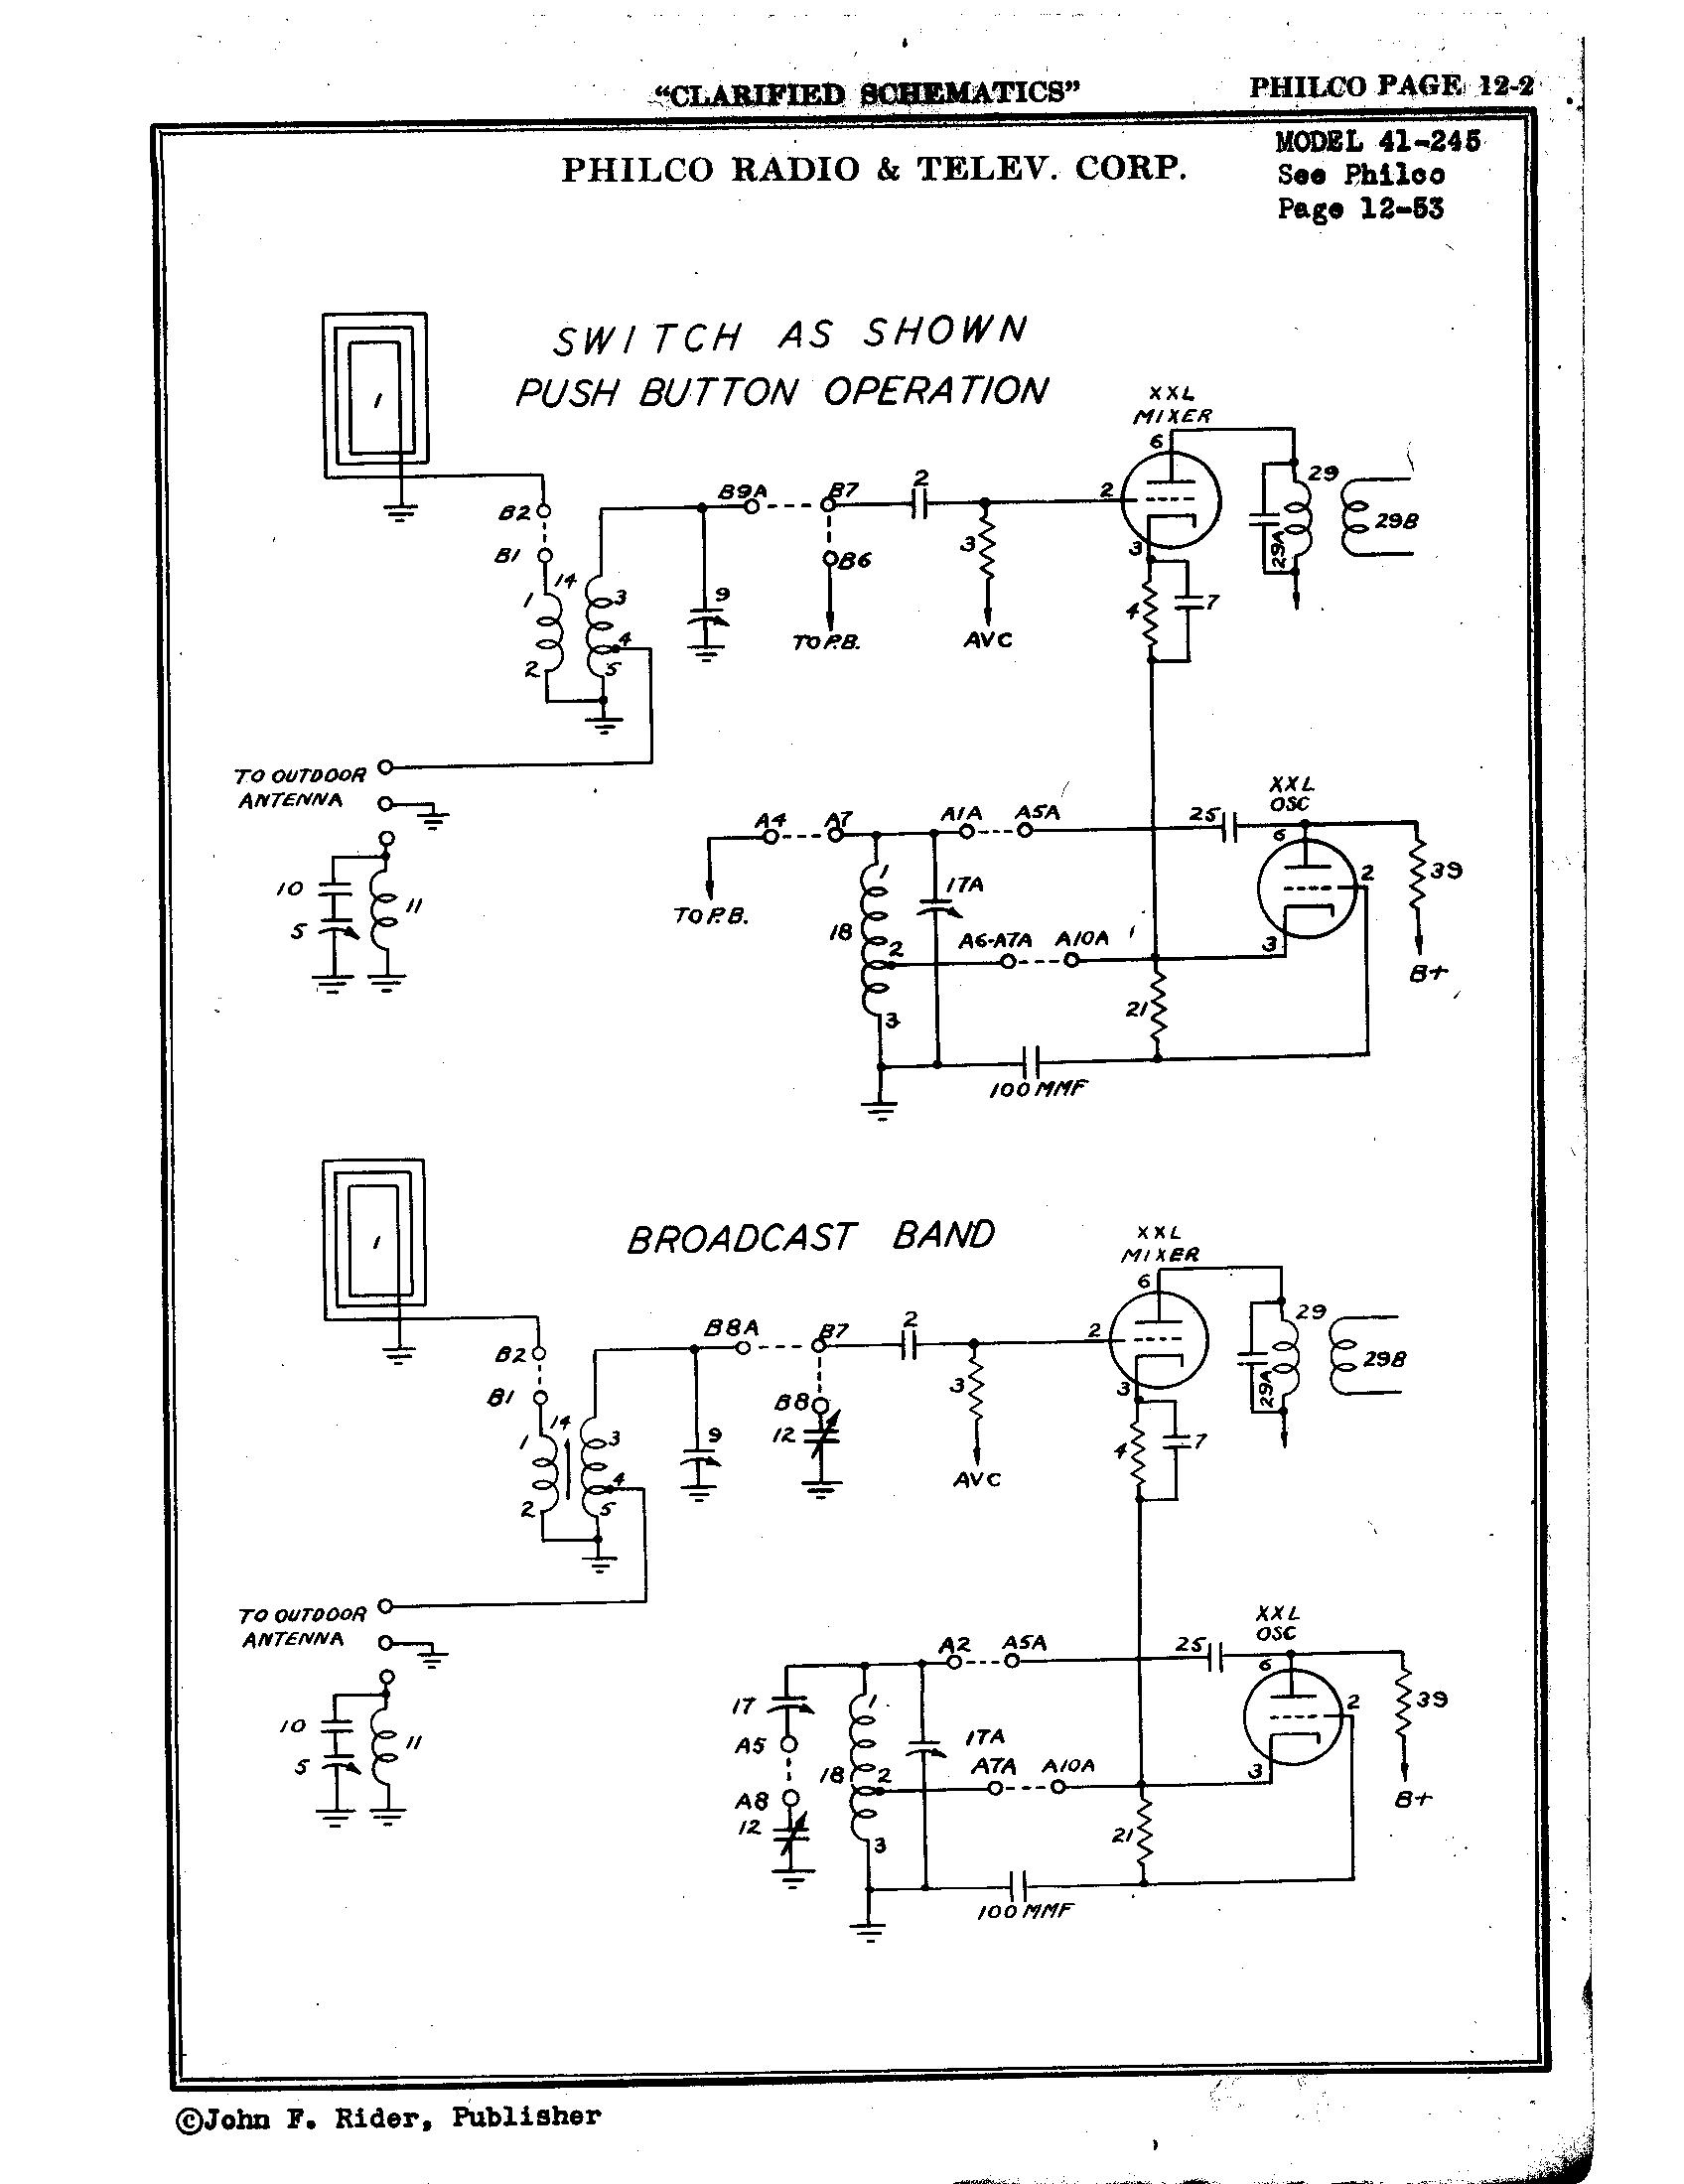 Philco Radio & Television Corp. 41-245 | Antique Electronic Supply on